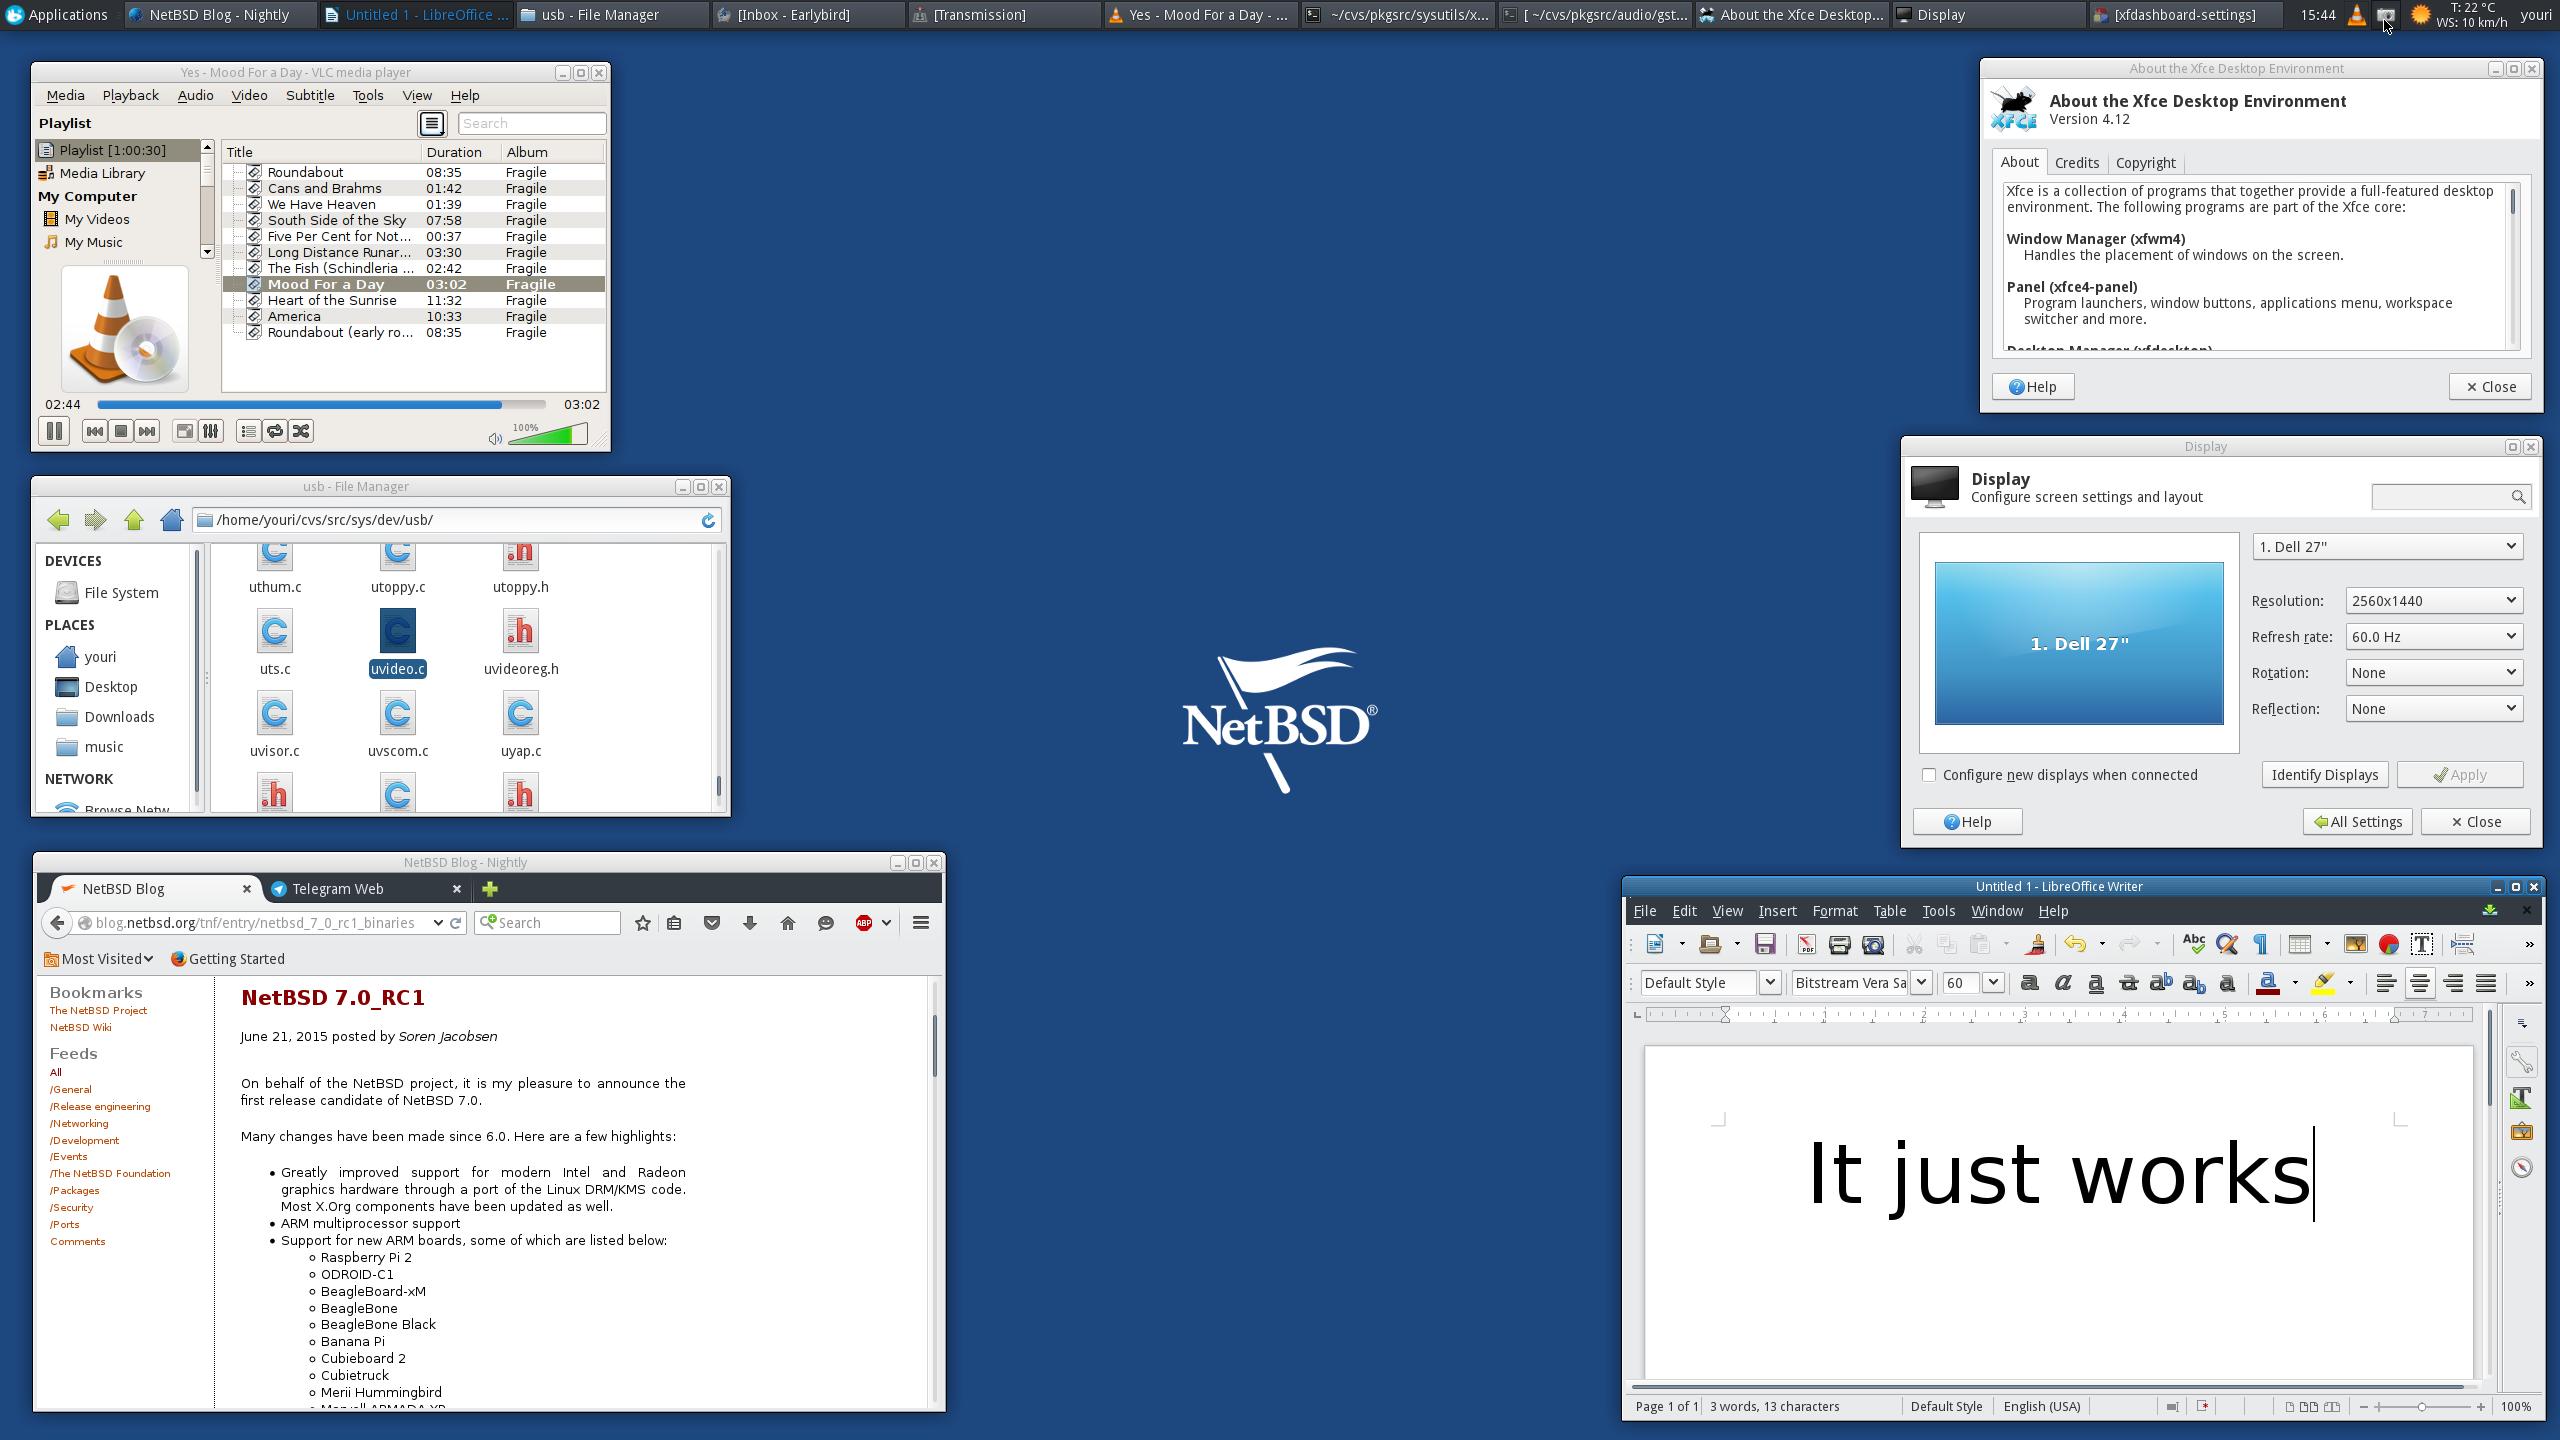 NetBSD 7.0 RC1